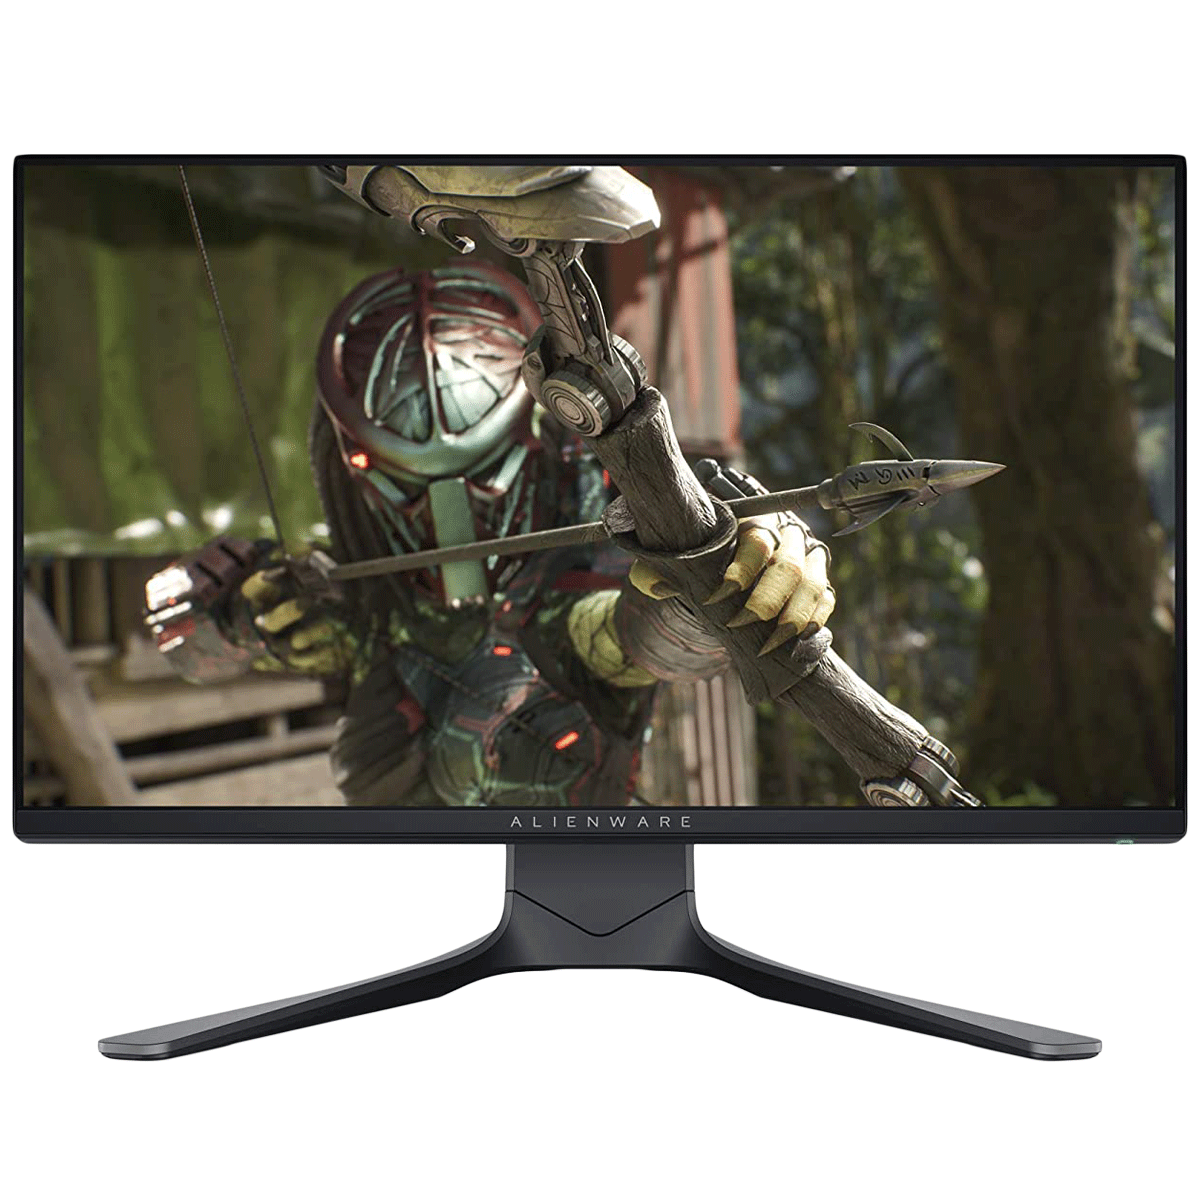 Dell Alienware 62.23cm (24.5 Inches) Full HD LED Backlit Gaming Monitor (AMD FreeSync Premium Technology, HDMI + USB + DisplayPort, 240 Hz, AW2521HF, Titan Gray)_1